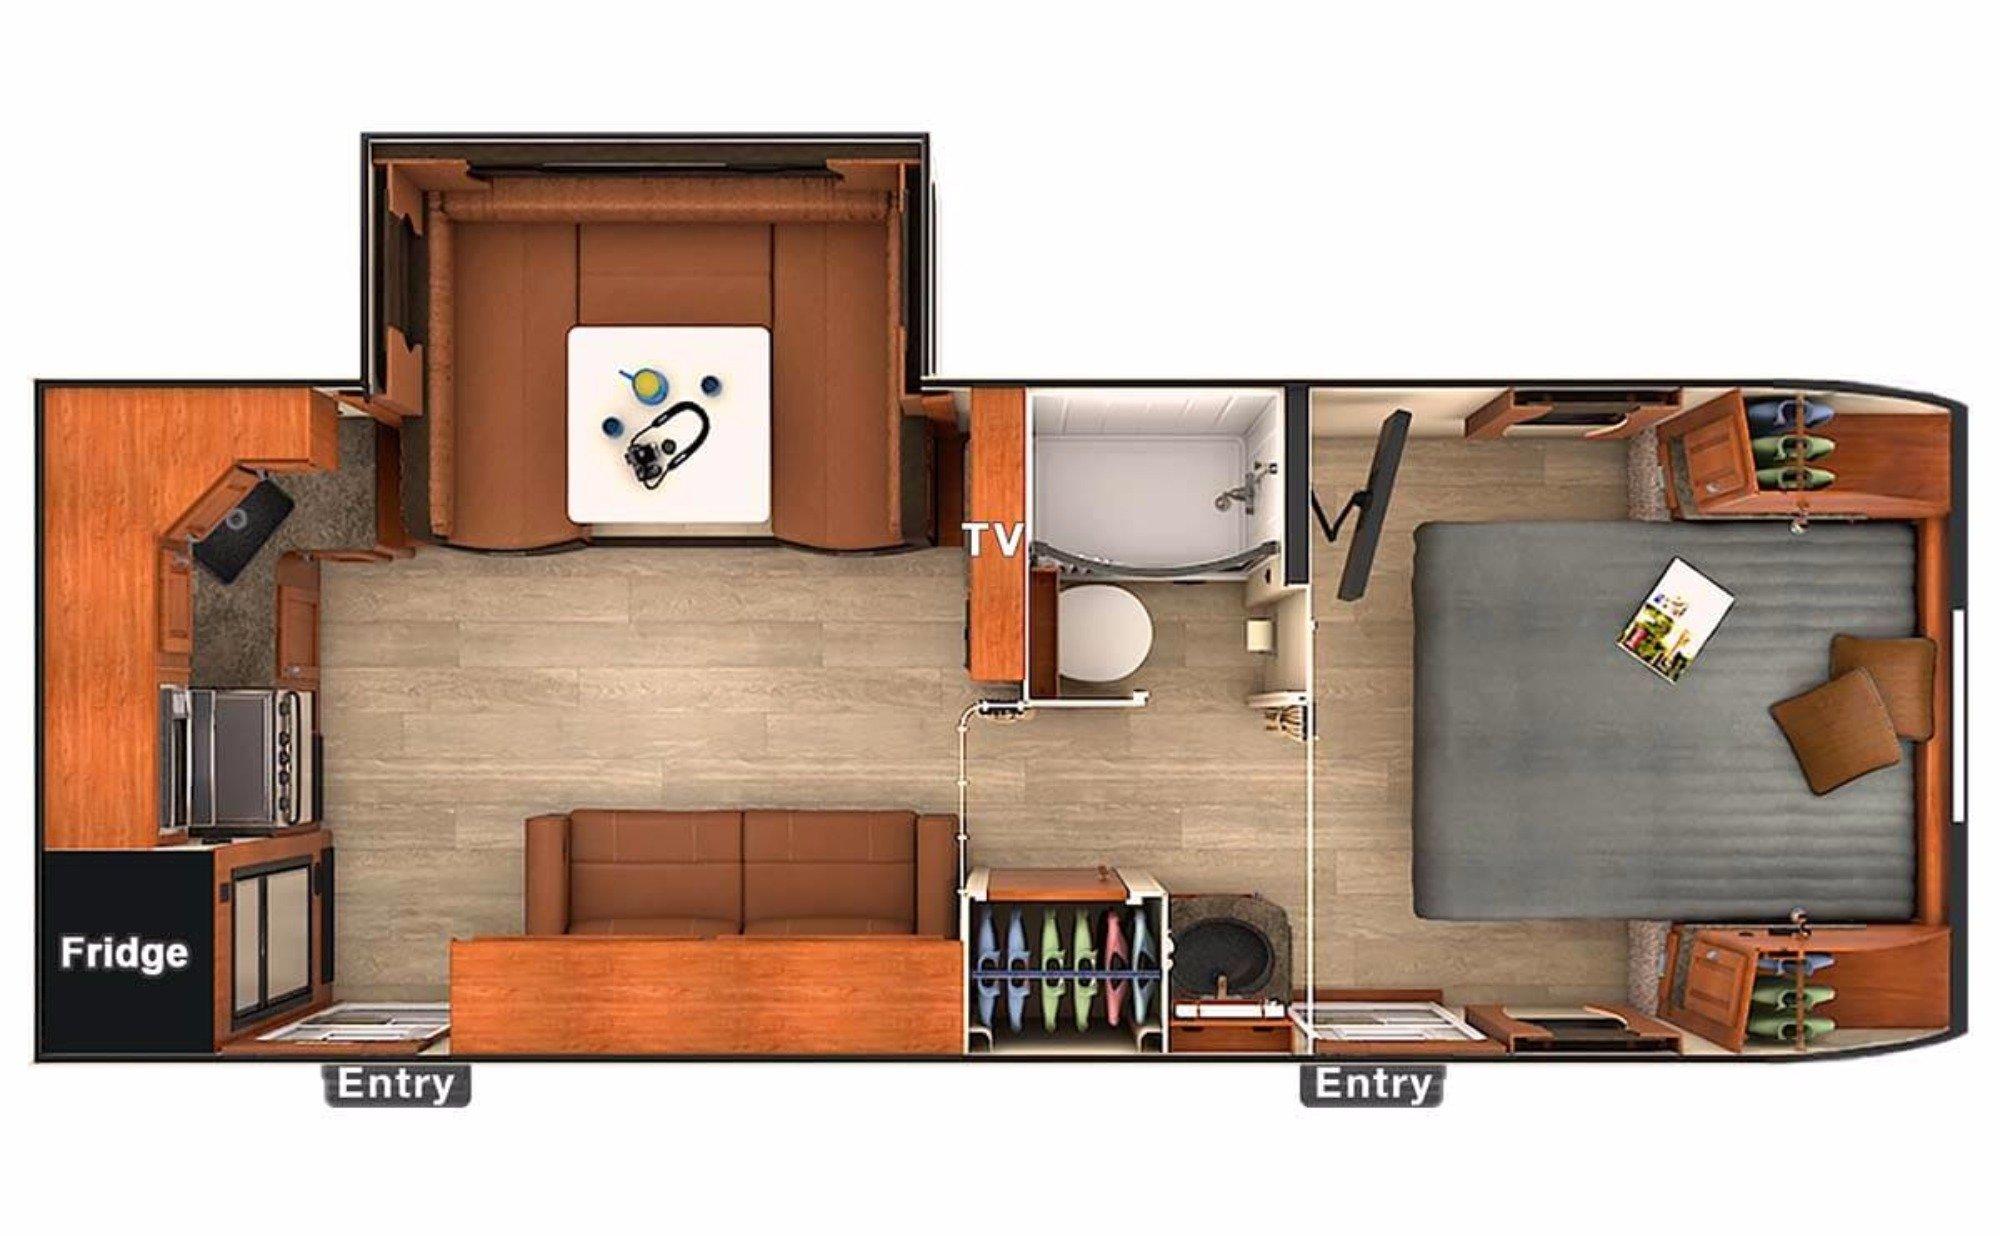 View Floor Plan for 2018 LANCE LANCE 2285